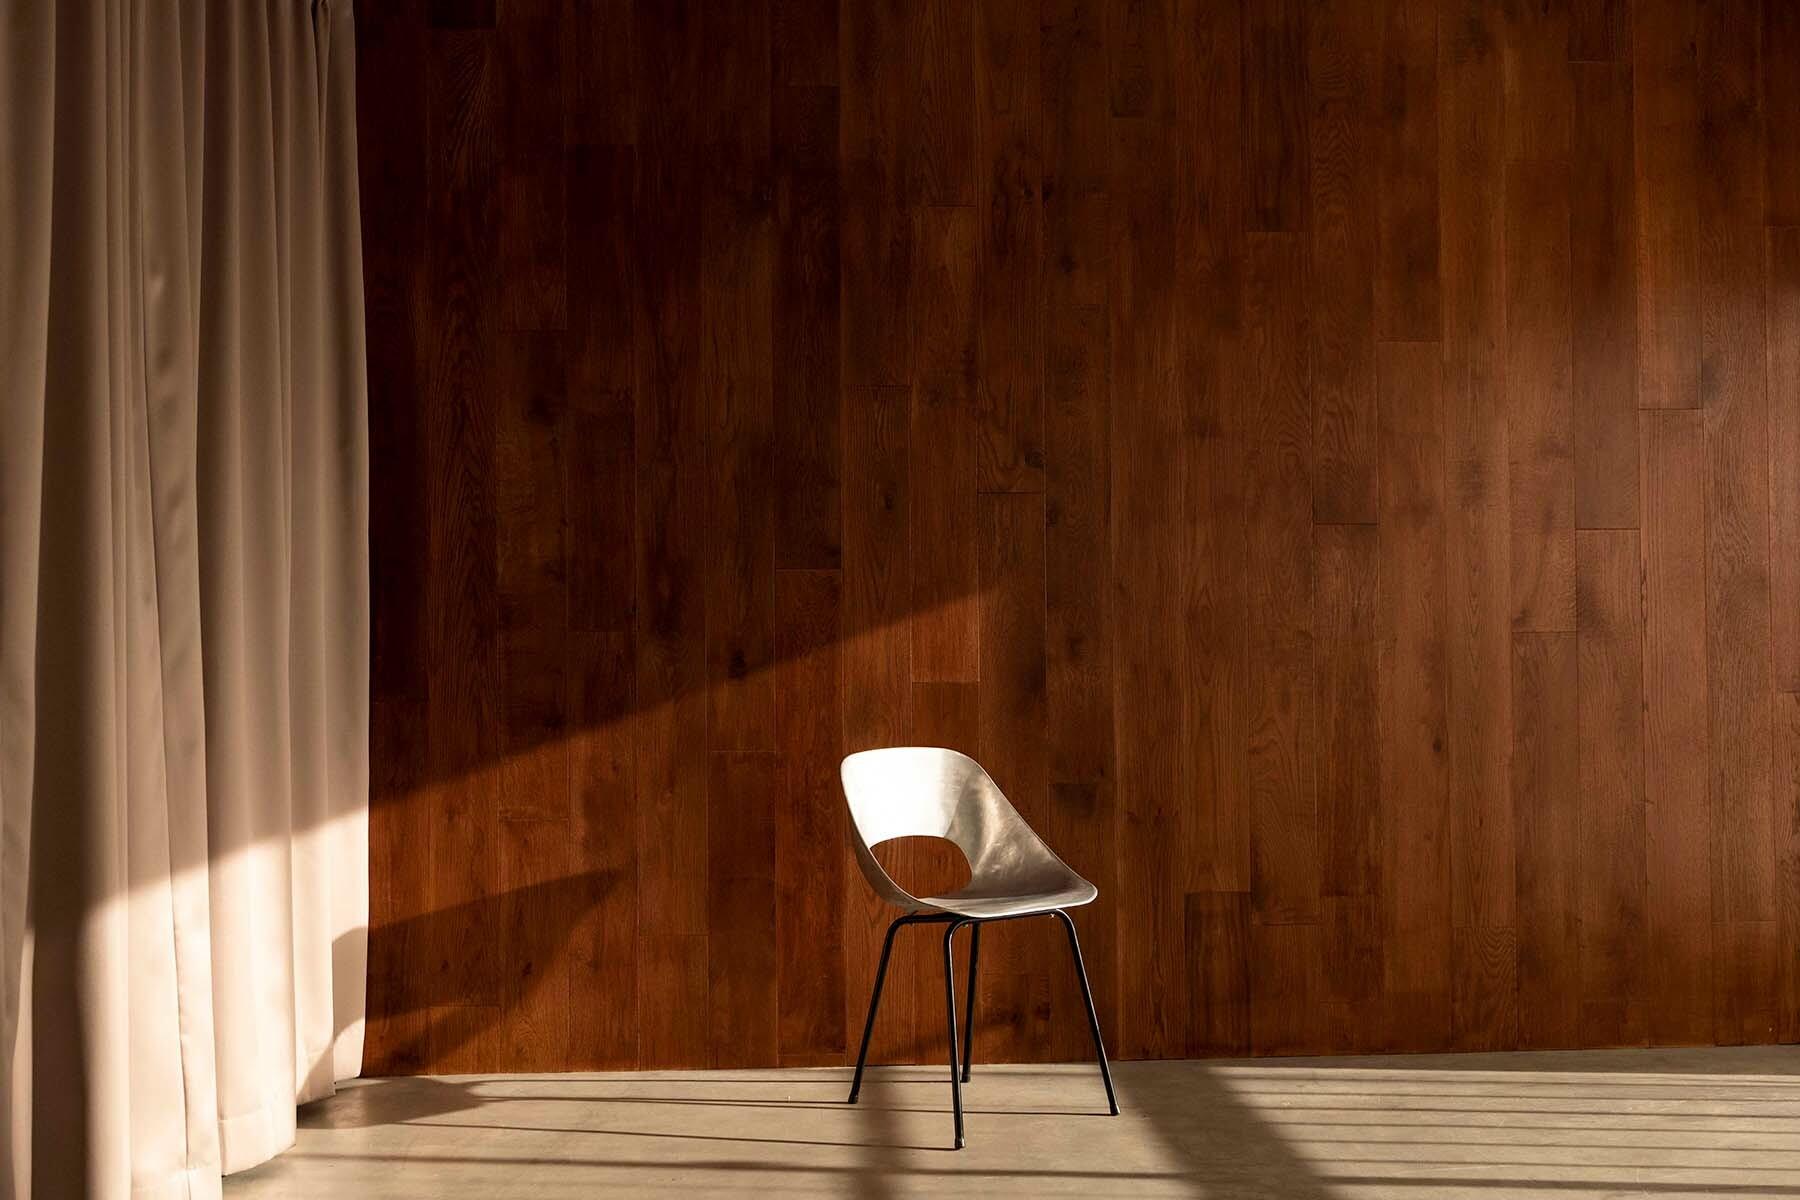 inTHE studio|nakameguro (インザスタジオ|ナカメグロ)MAIN ROOM